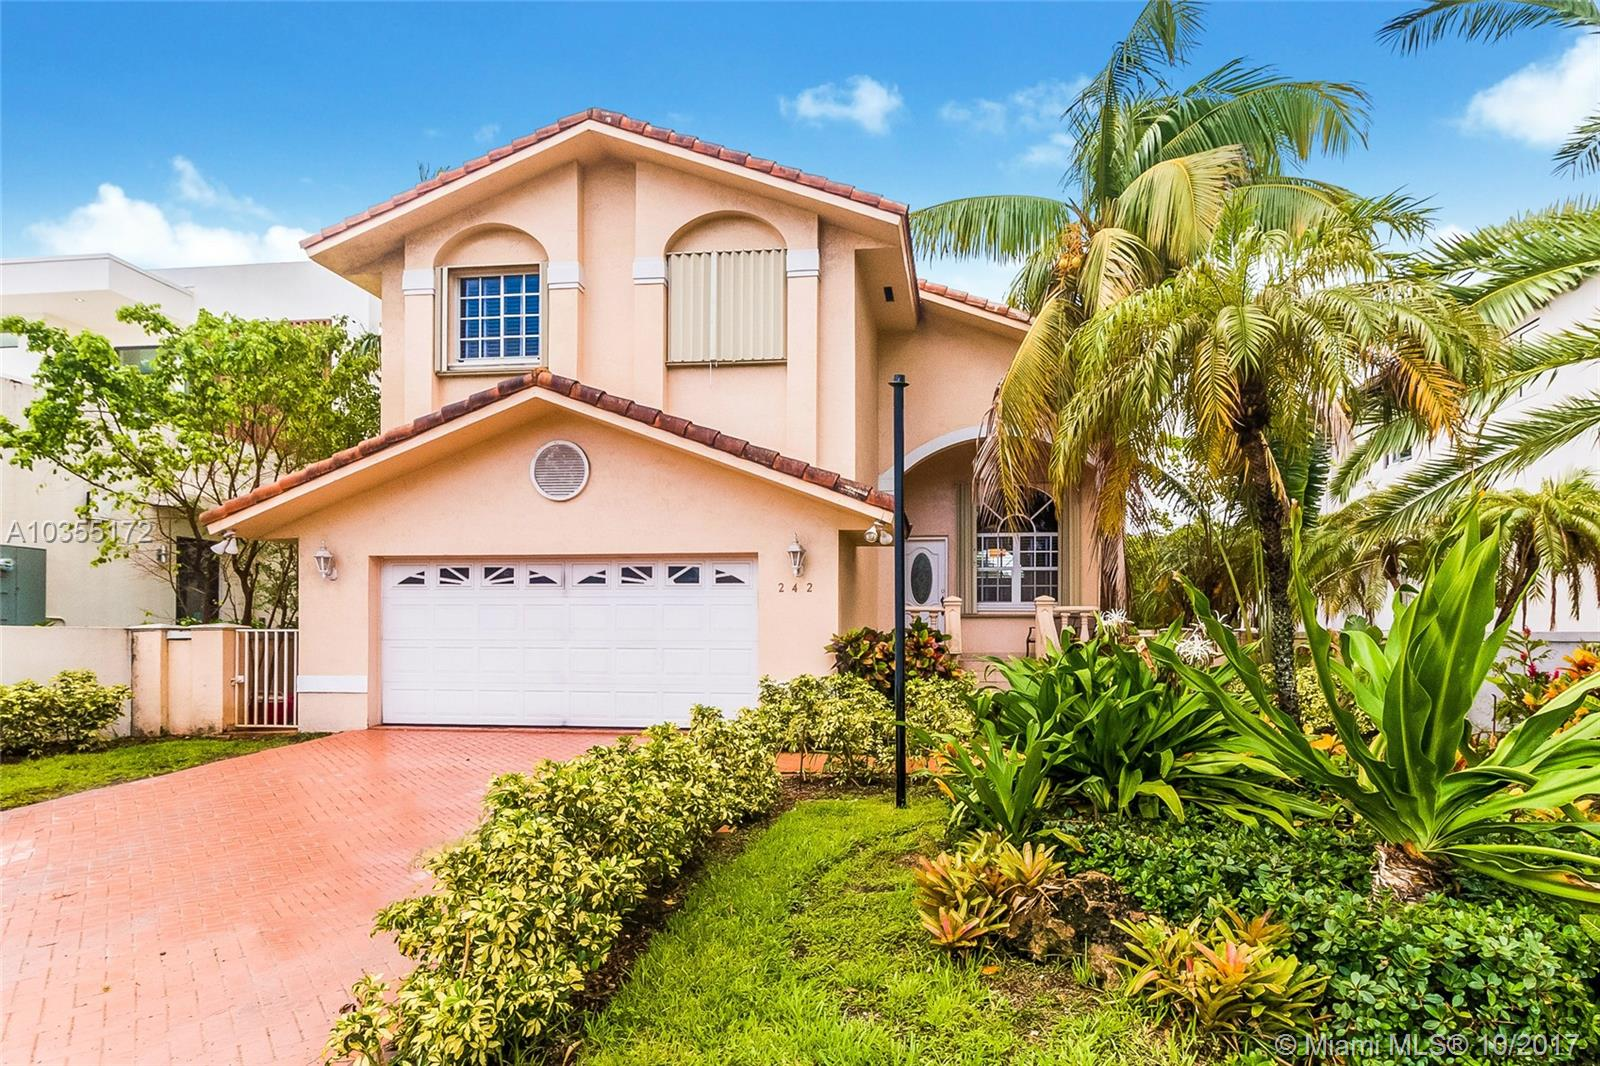 242 Palm Ave, Miami Beach FL, 33139